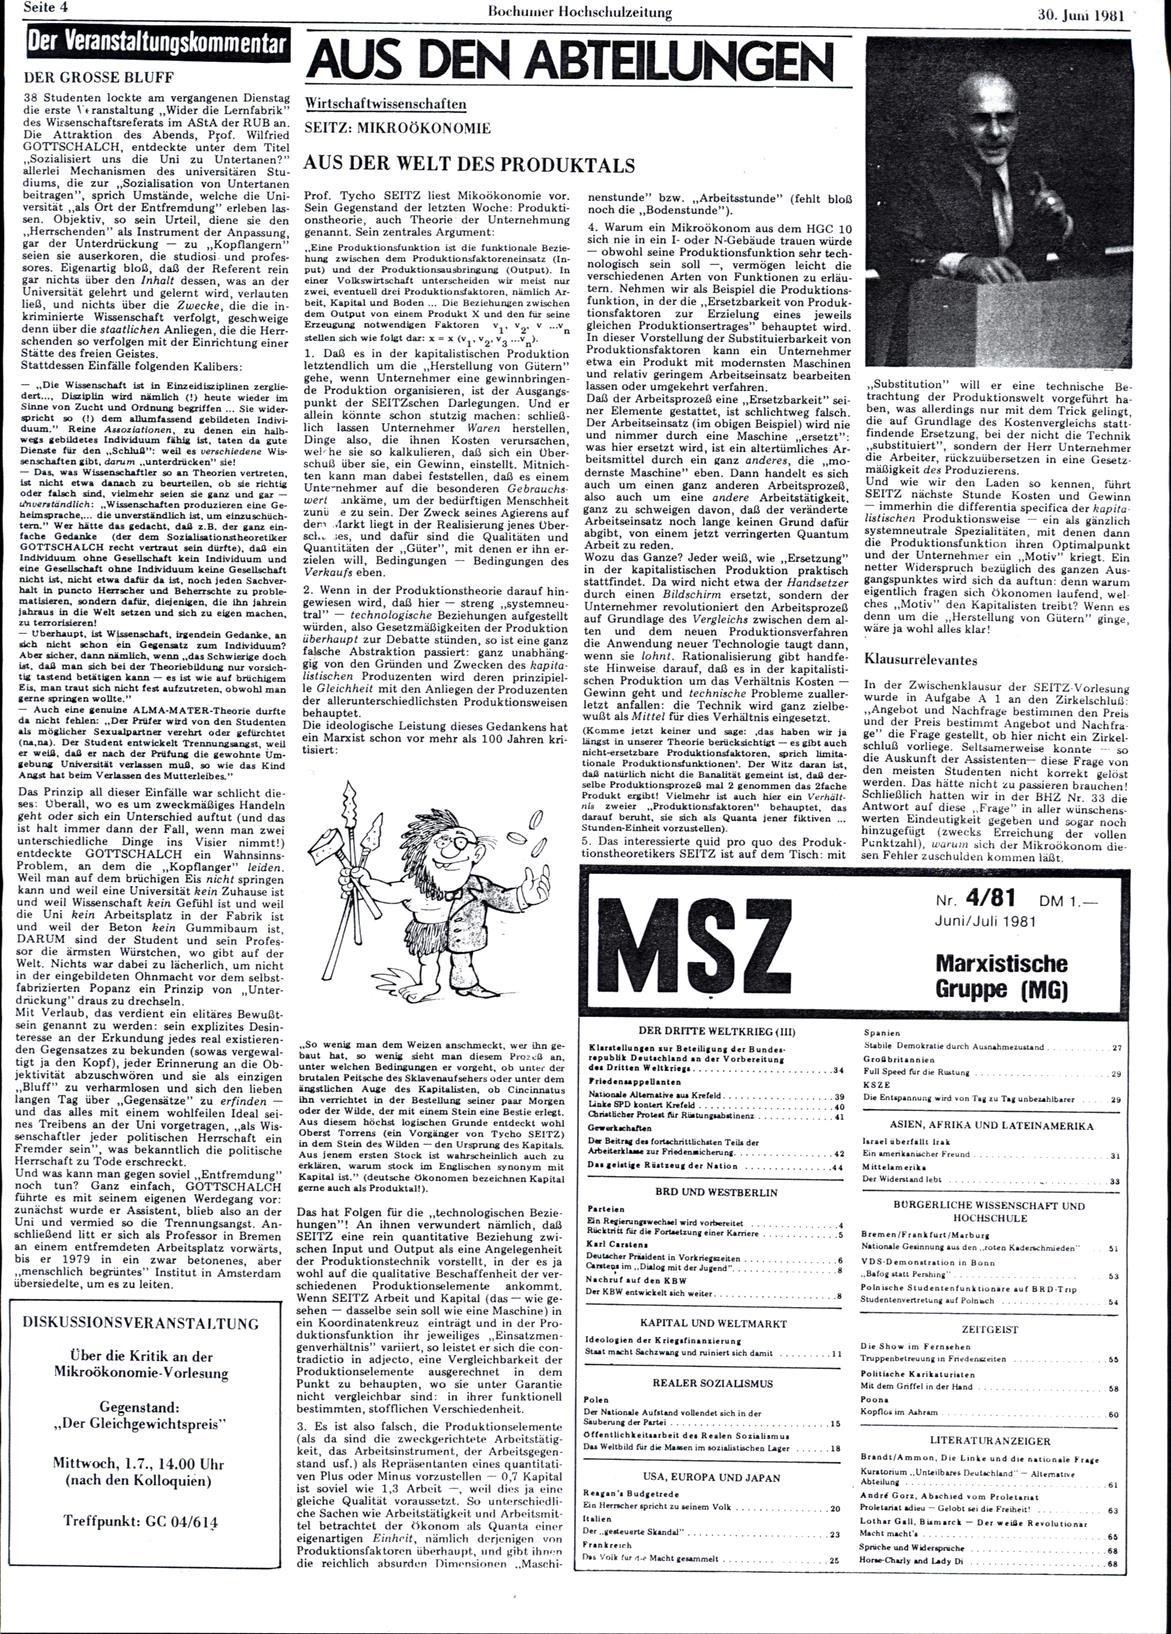 Bochum_BHZ_19810630_035_004